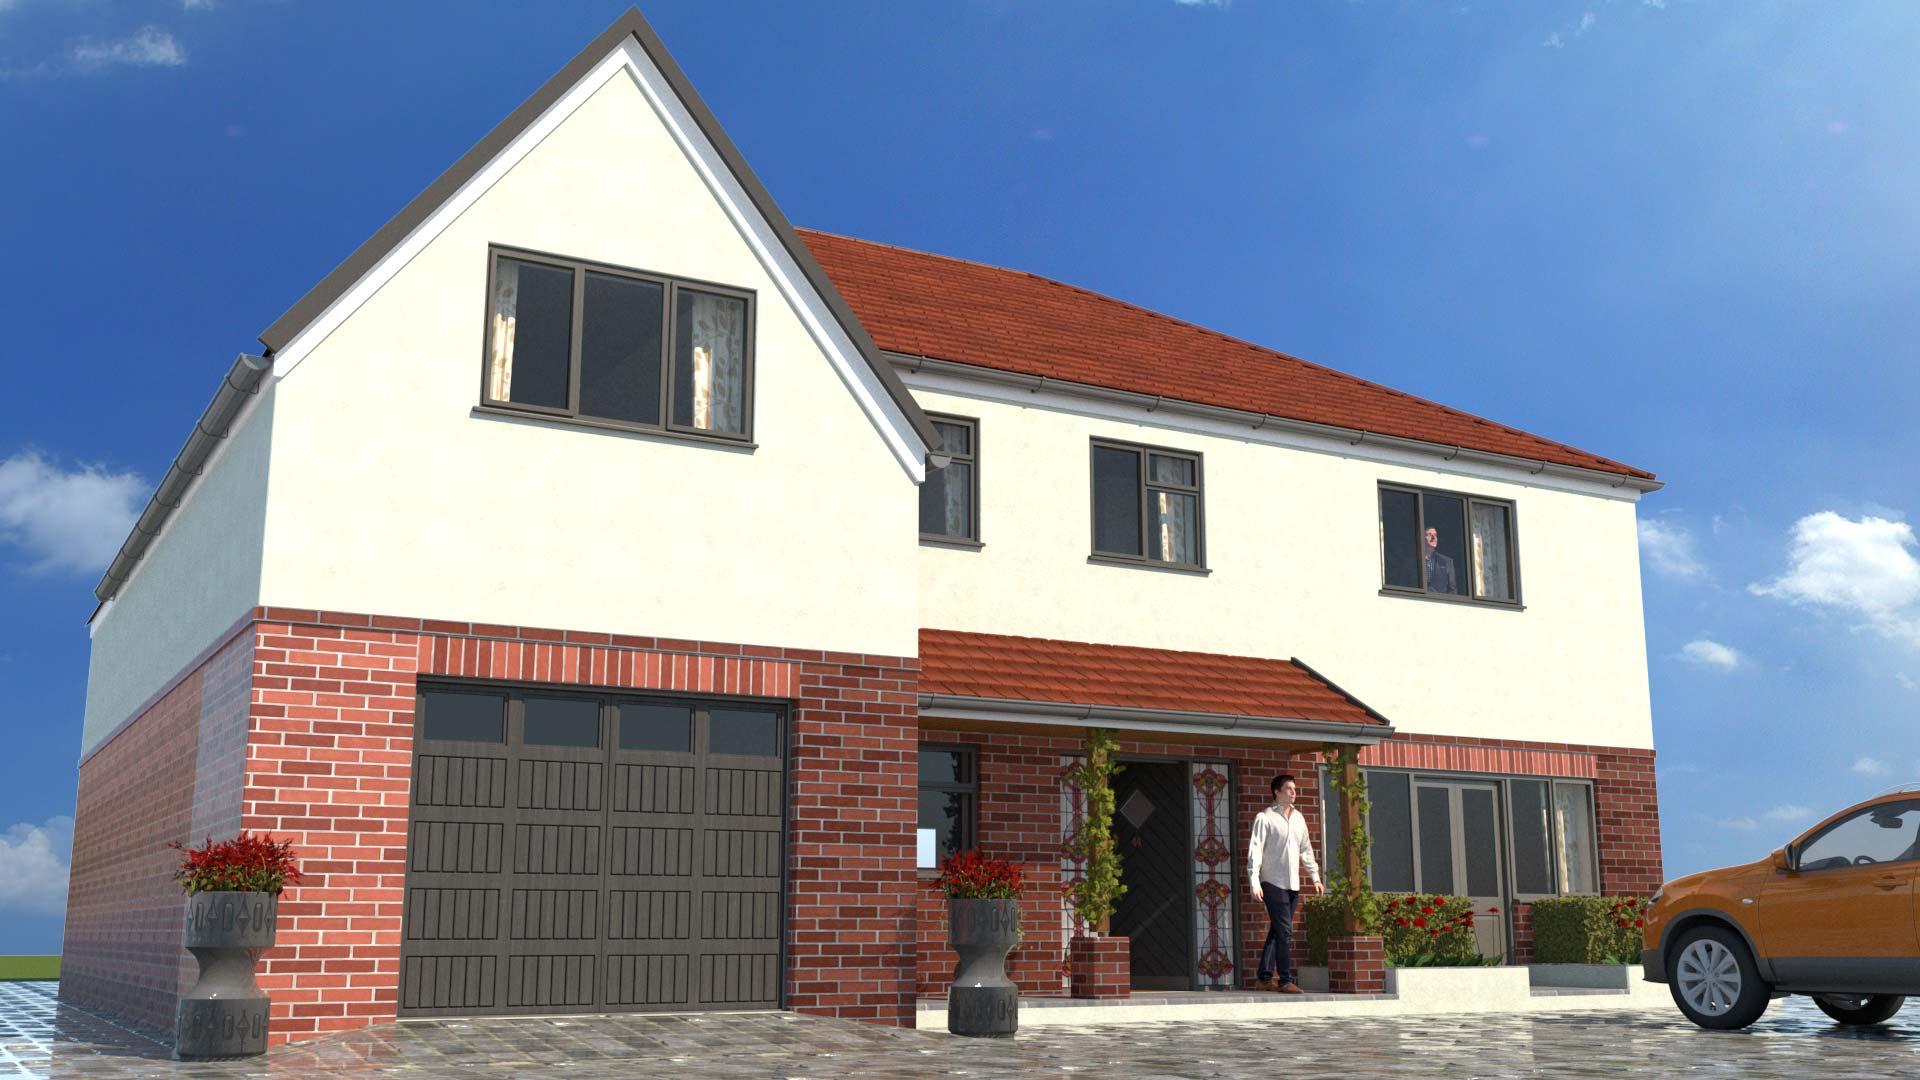 house CGI rendering image